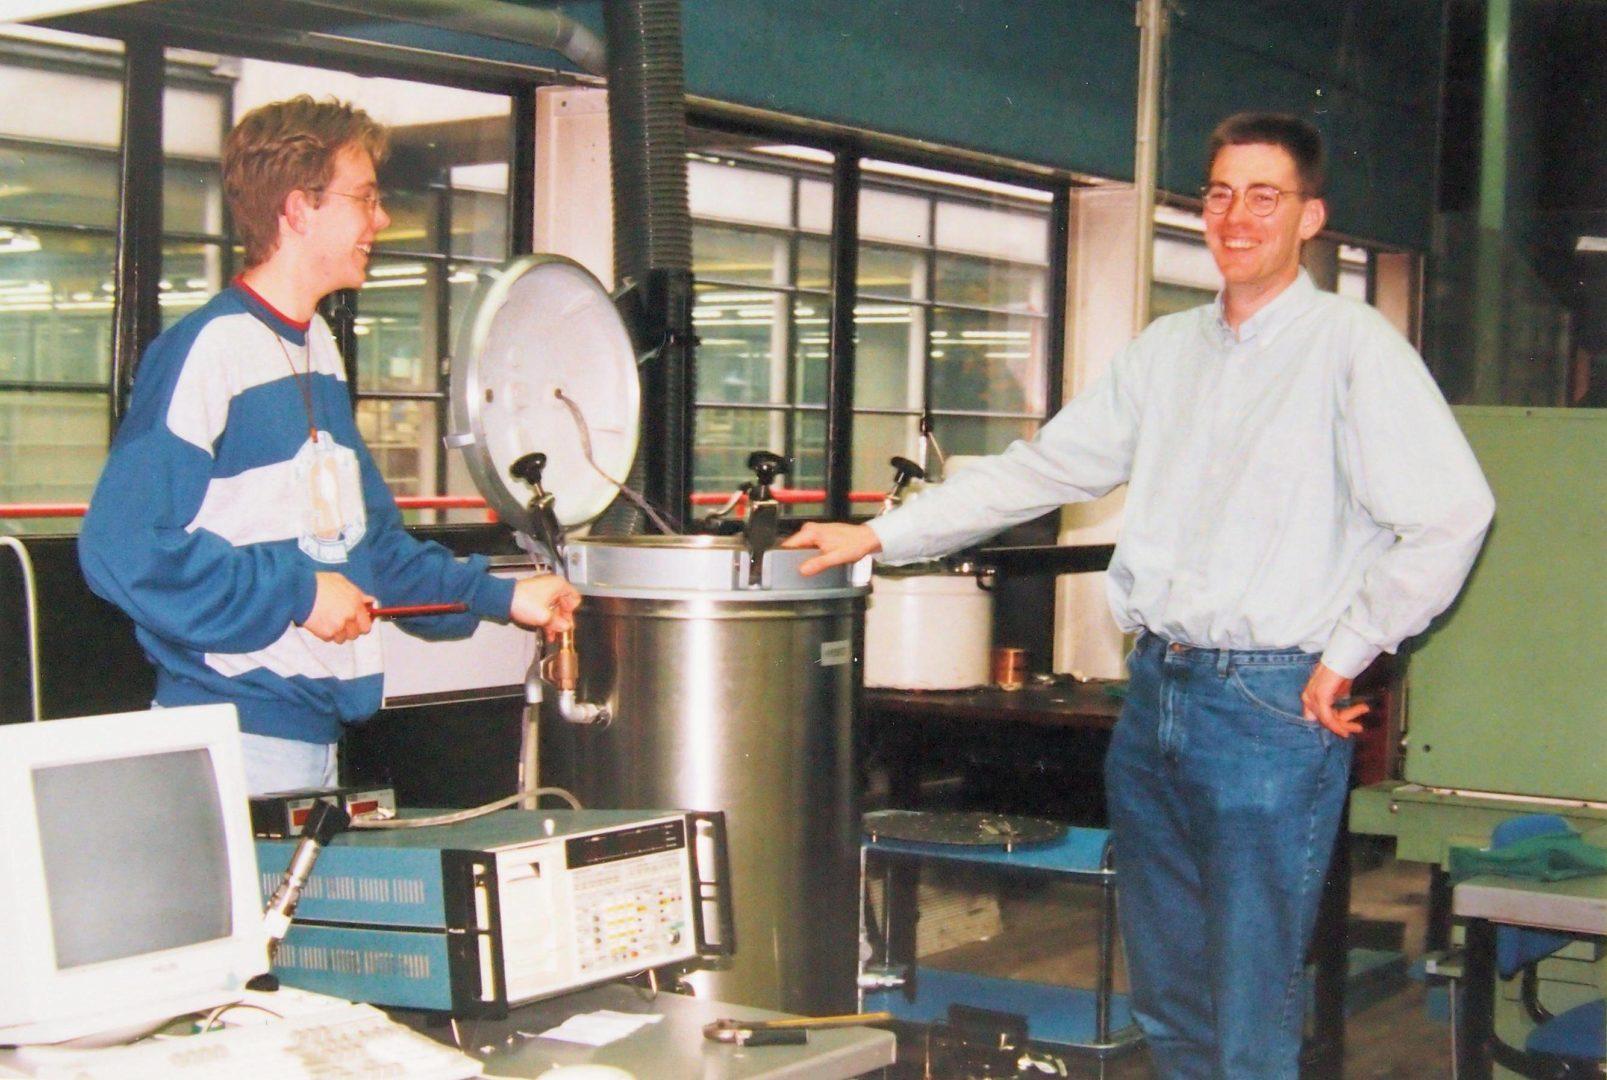 NL-Eindhoven TU 19940419 Test Site Research Sterizer Process Webeco Model C End Presentation By Edwin Loenen